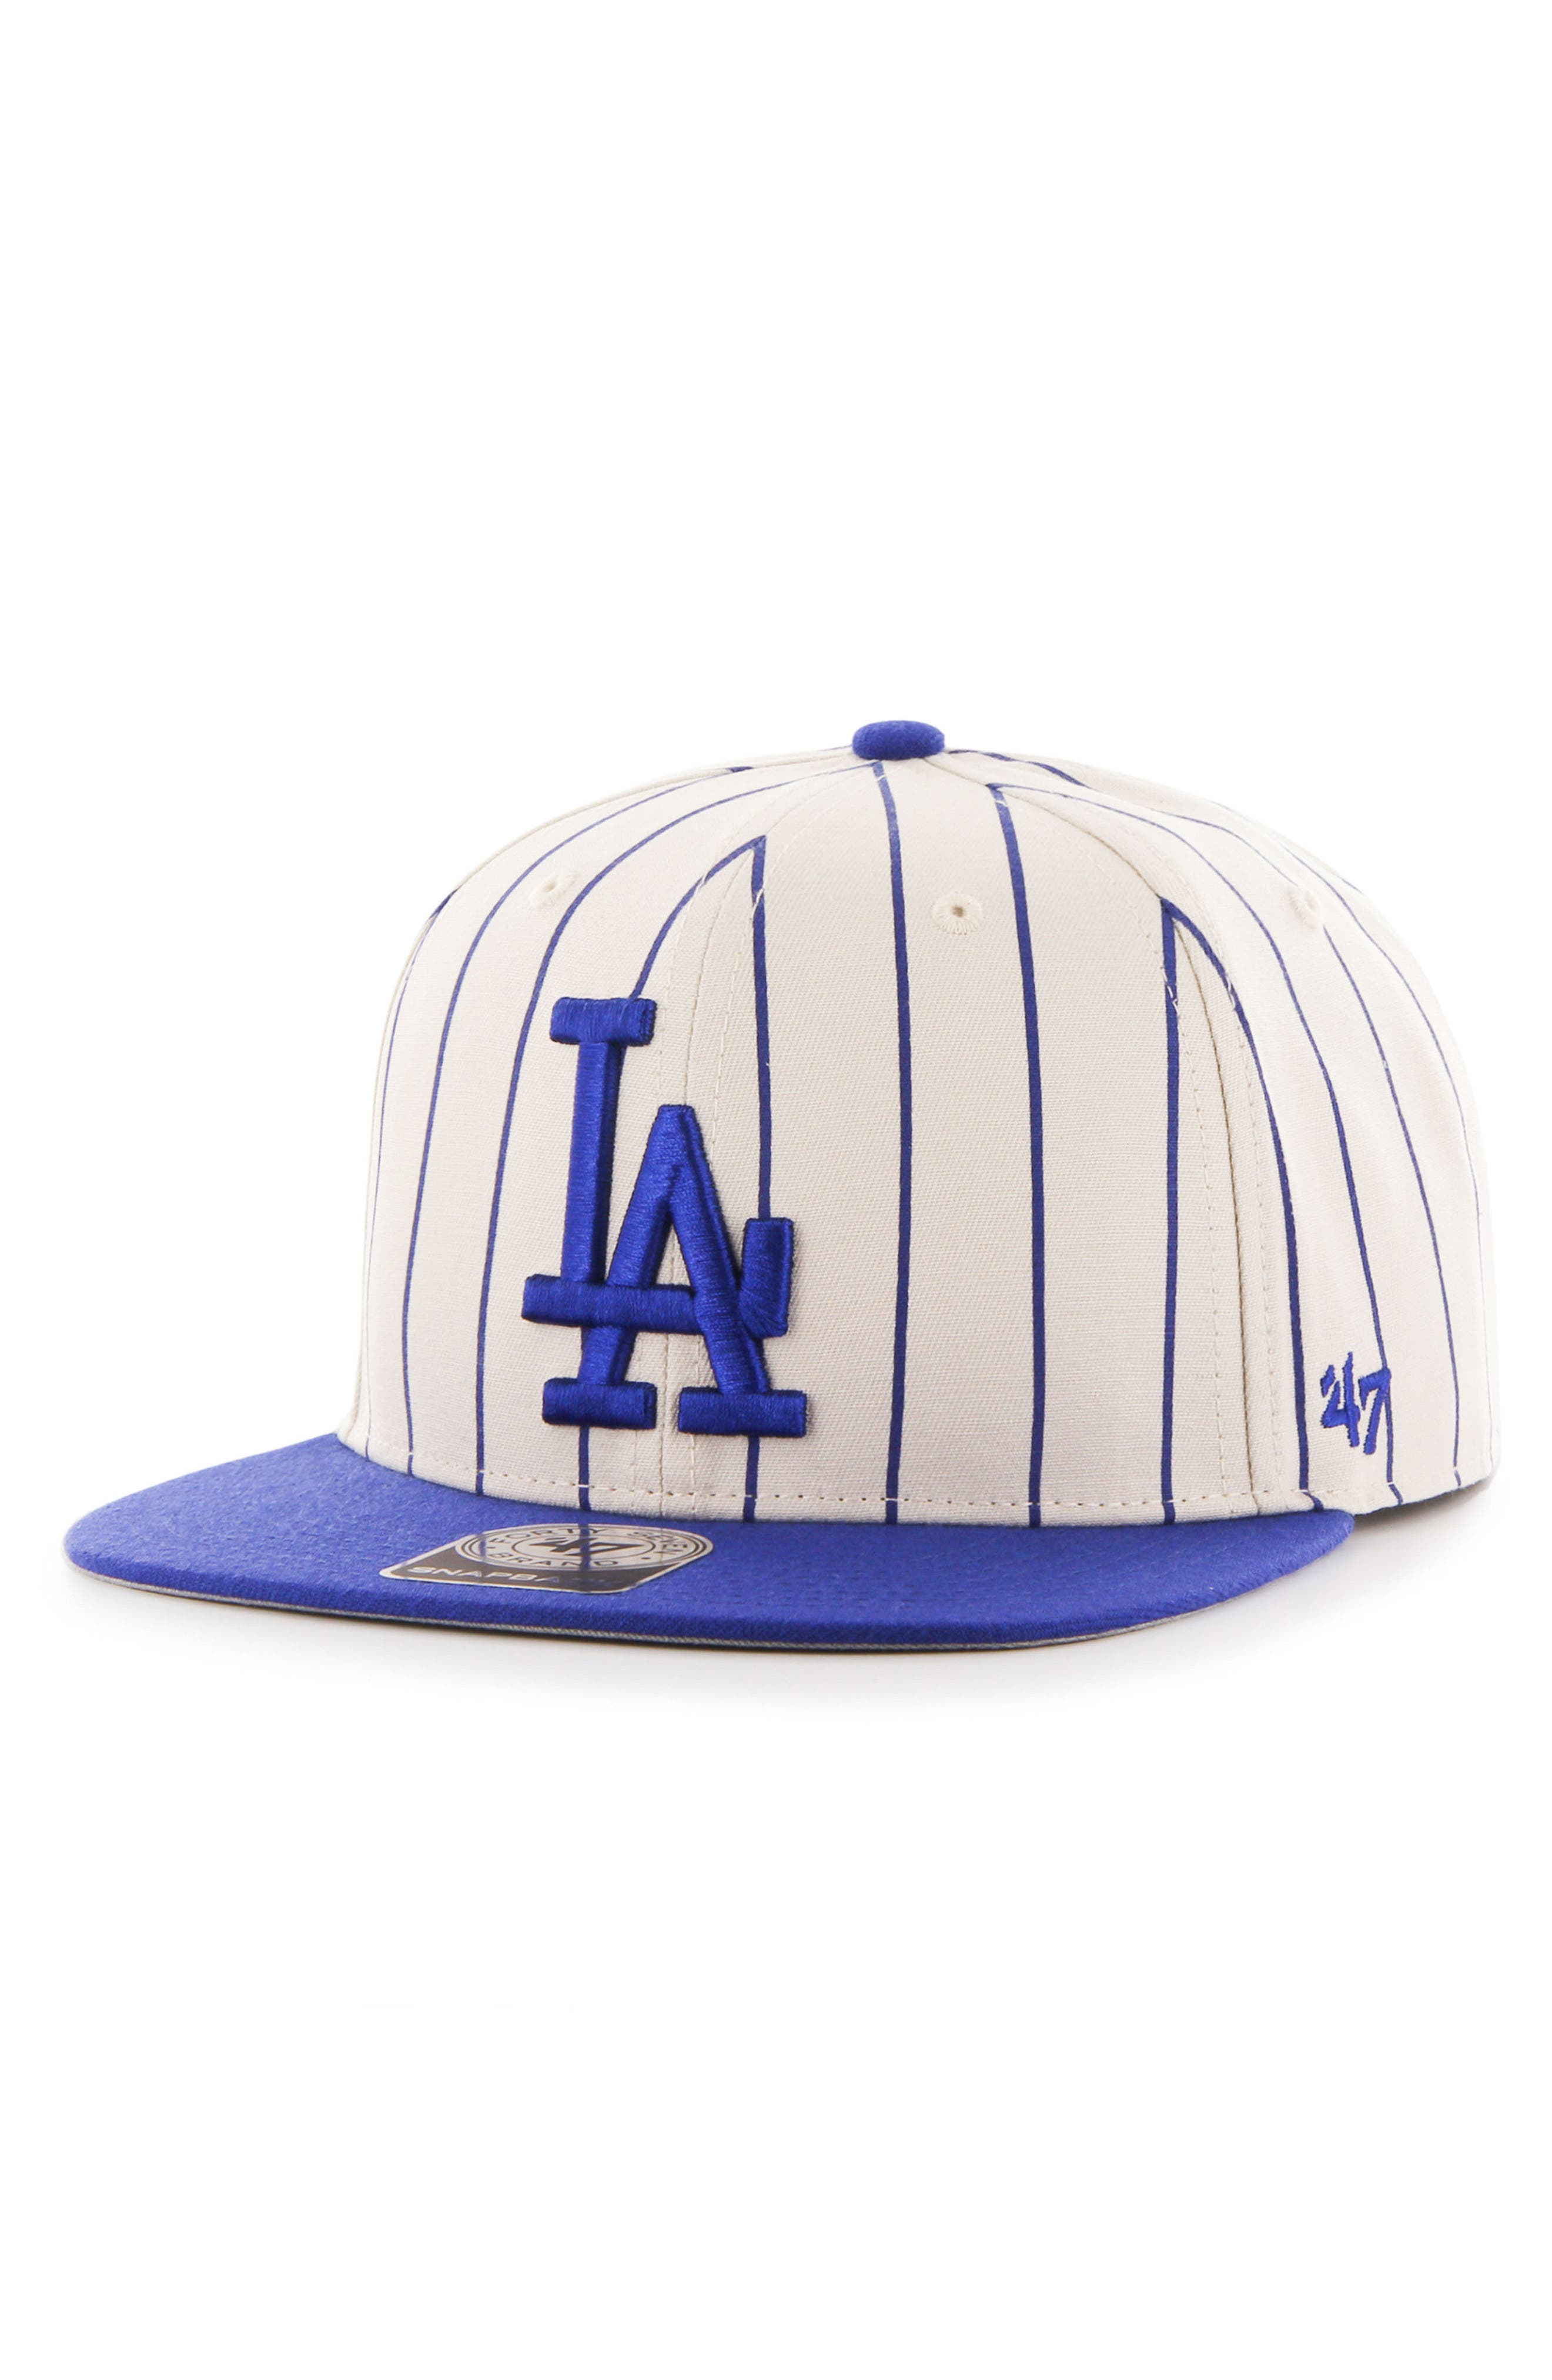 LA Dodgers Pinstripe Baseball Cap,                         Main,                         color, Open White